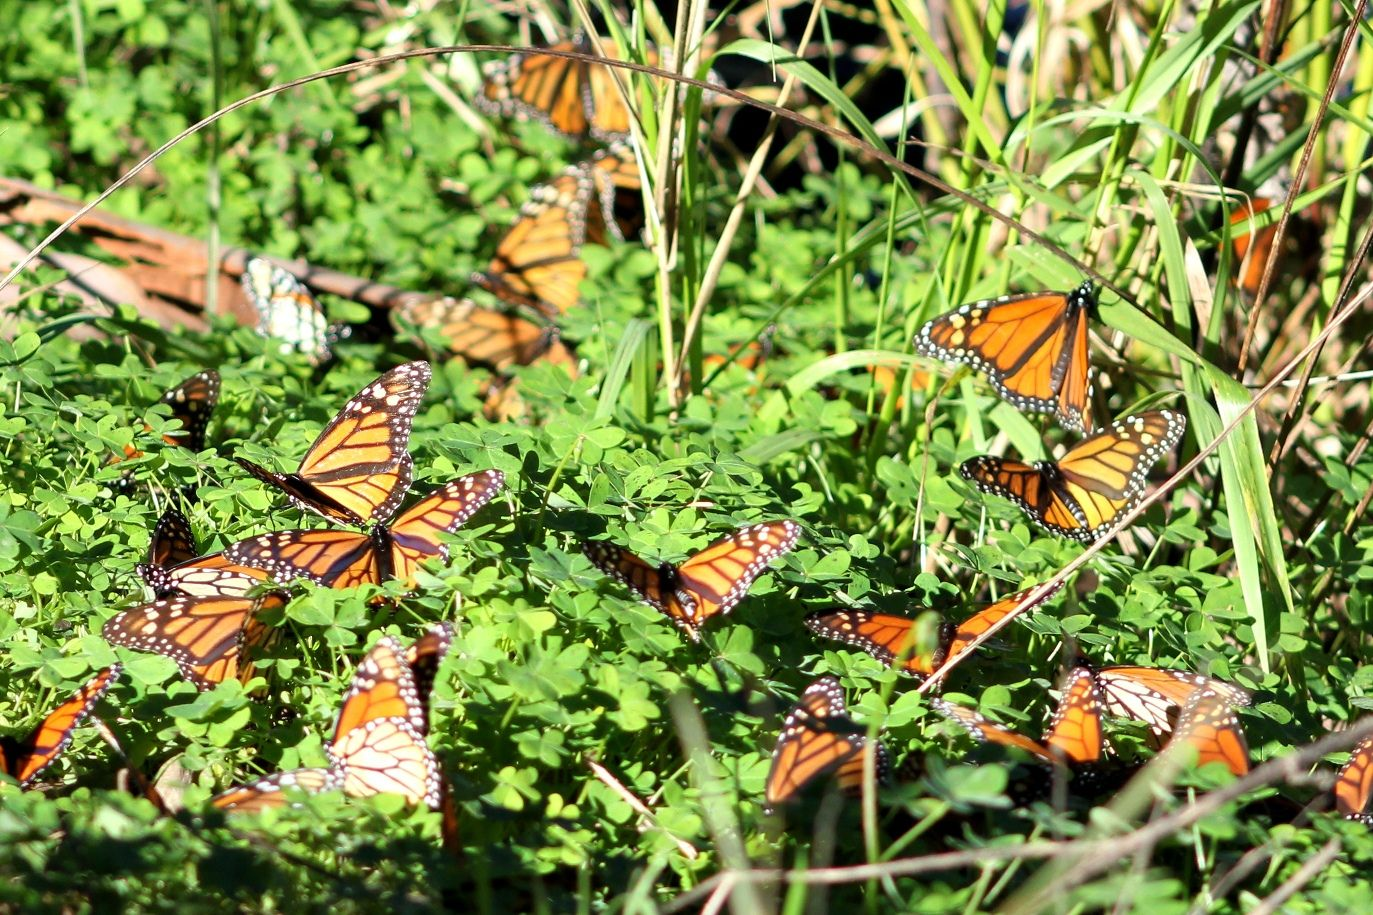 Butterflies everywhere! - Photo credit: Valerie Kushnerov